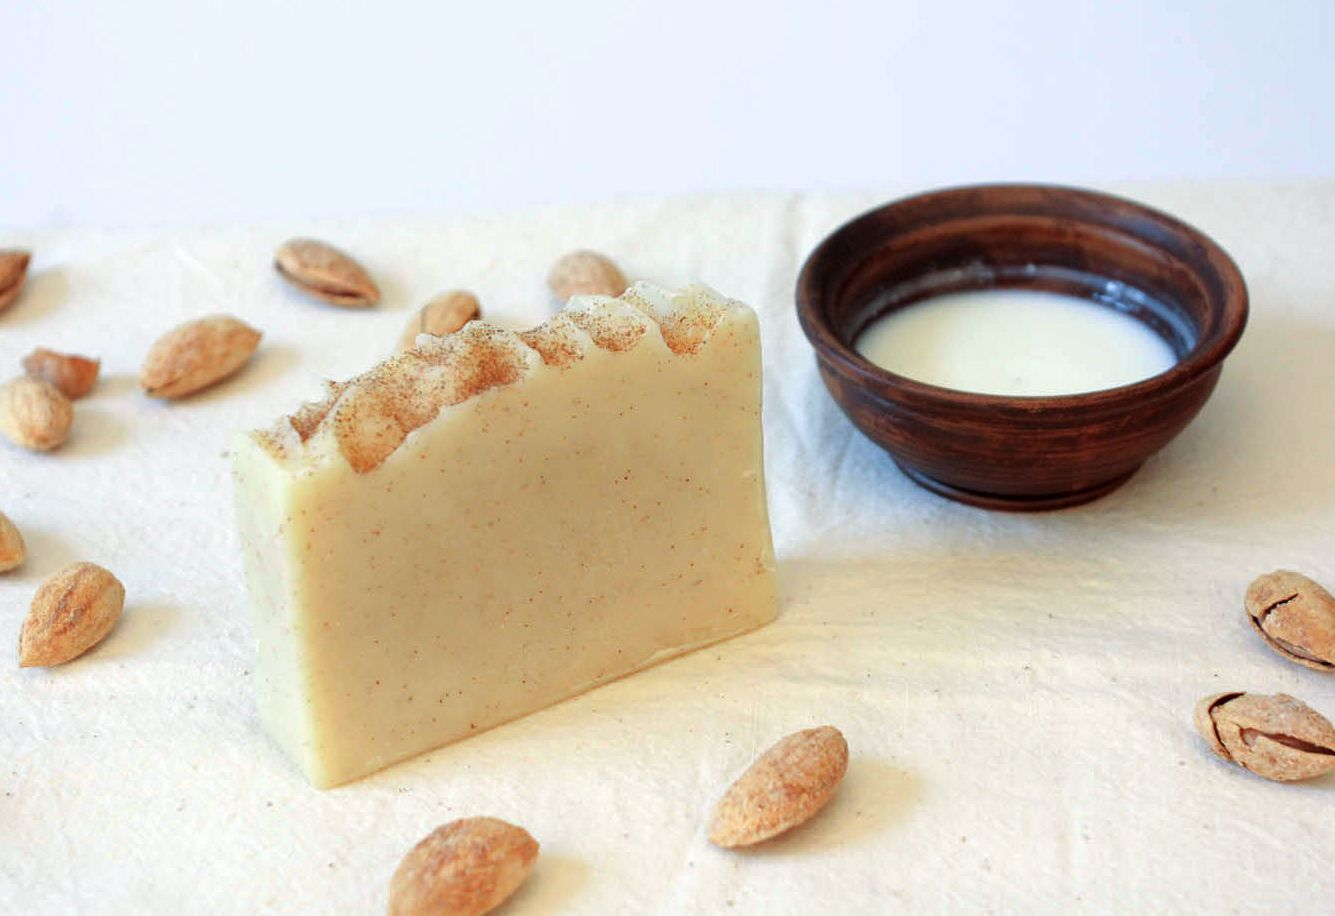 Handmade soap Almonds and goat milk photo 5